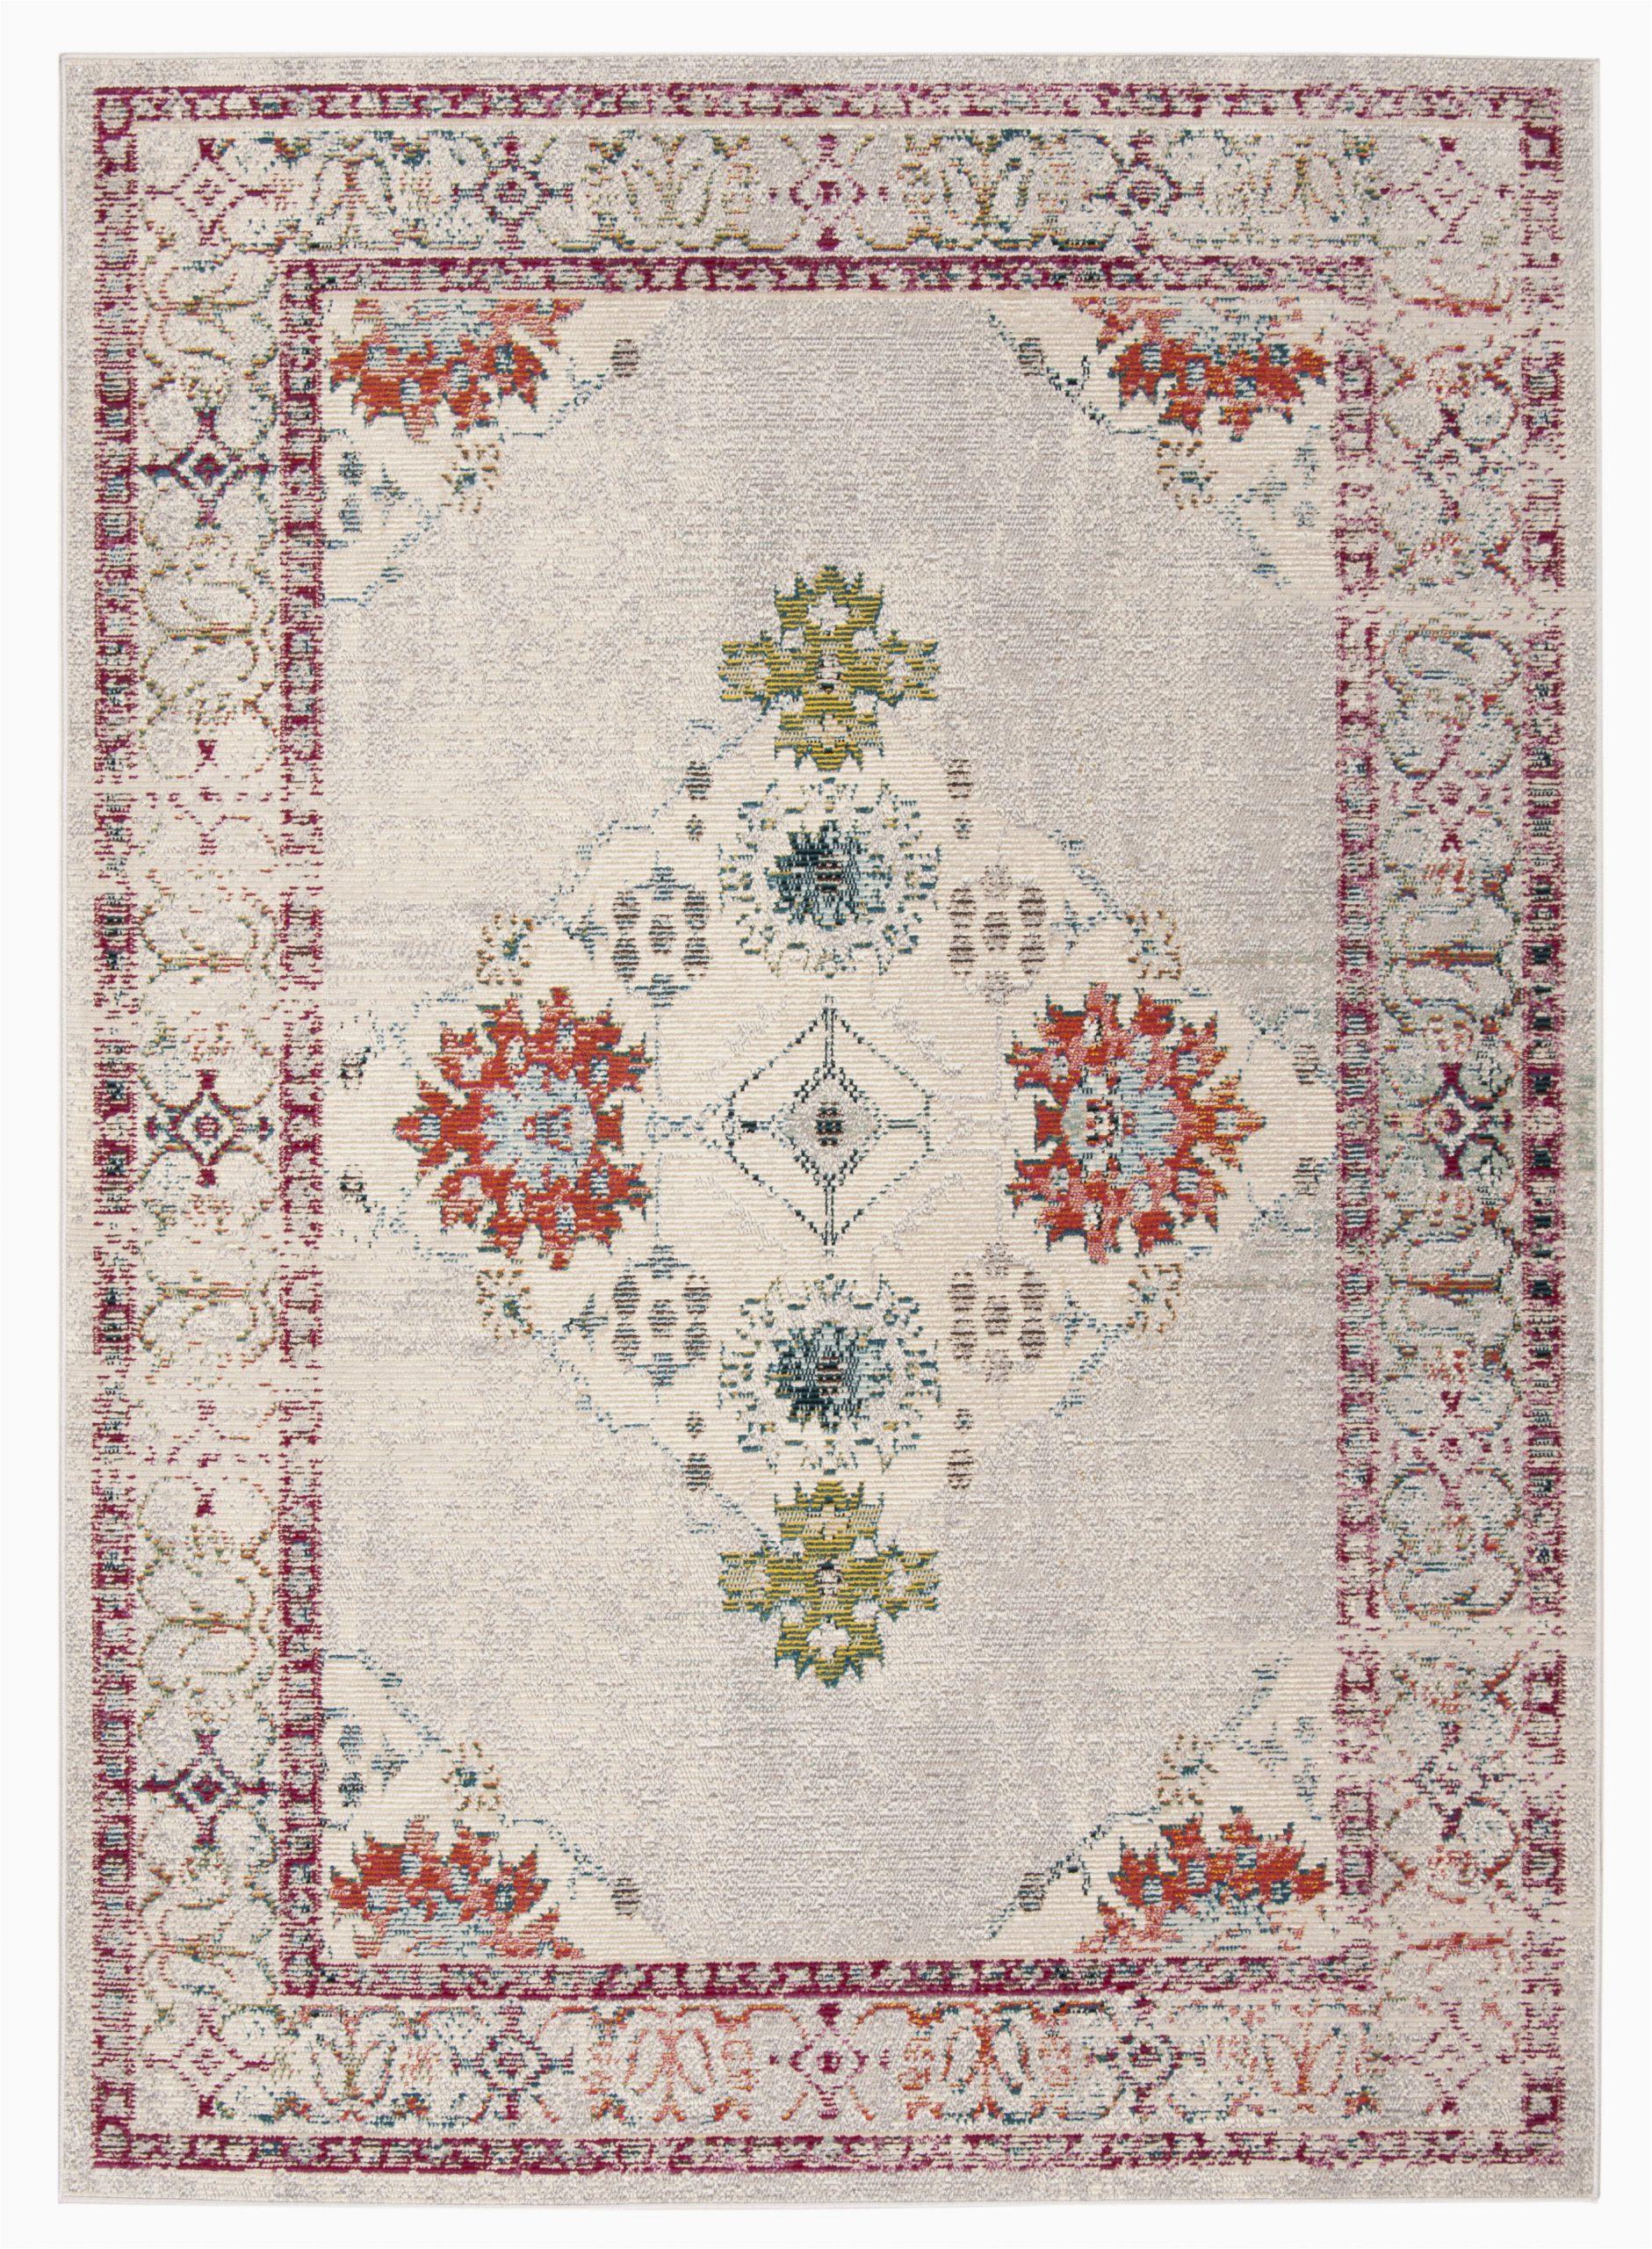 haneul creamgray area rug